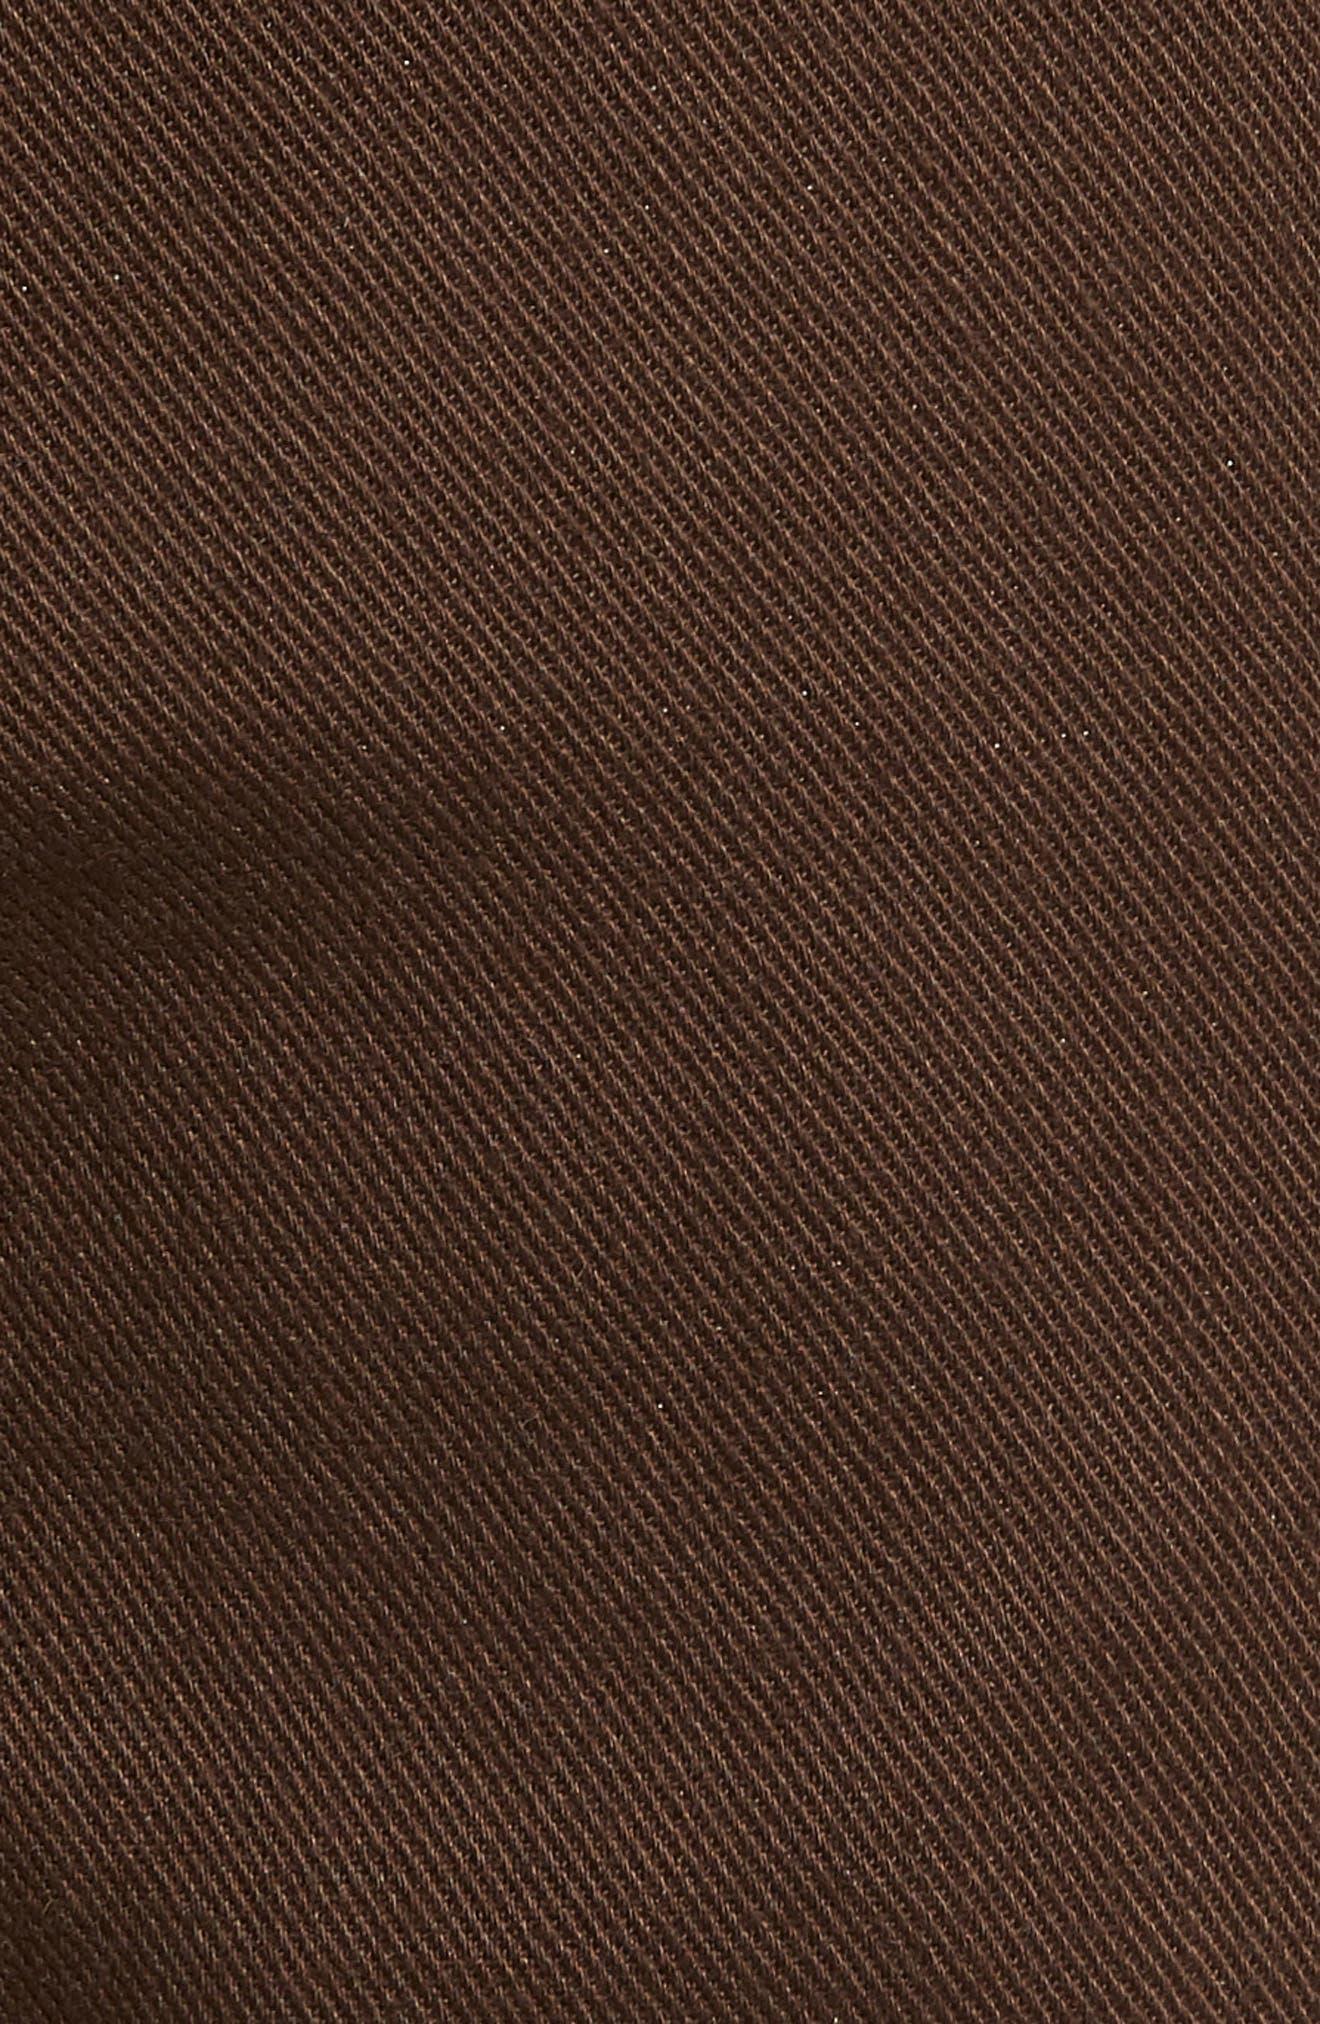 VSM Prowler Shorts,                             Alternate thumbnail 14, color,